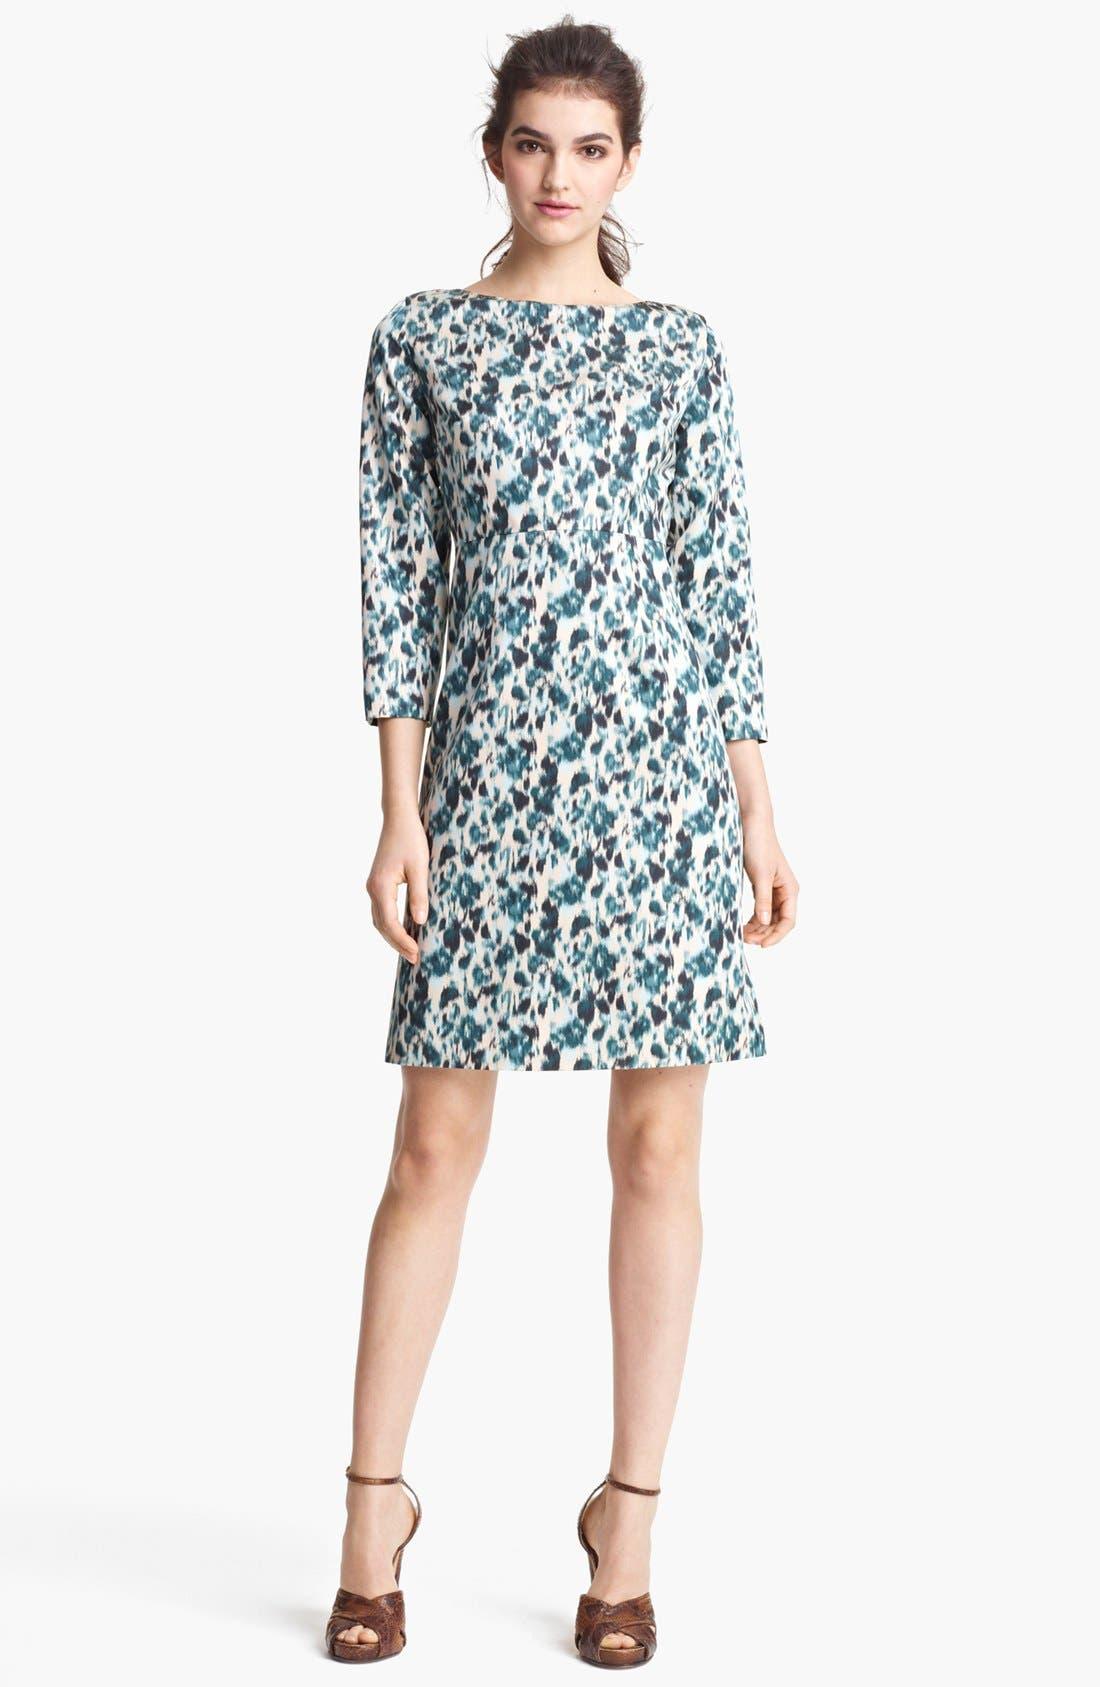 Alternate Image 1 Selected - MARC JACOBS Floral Print Dress